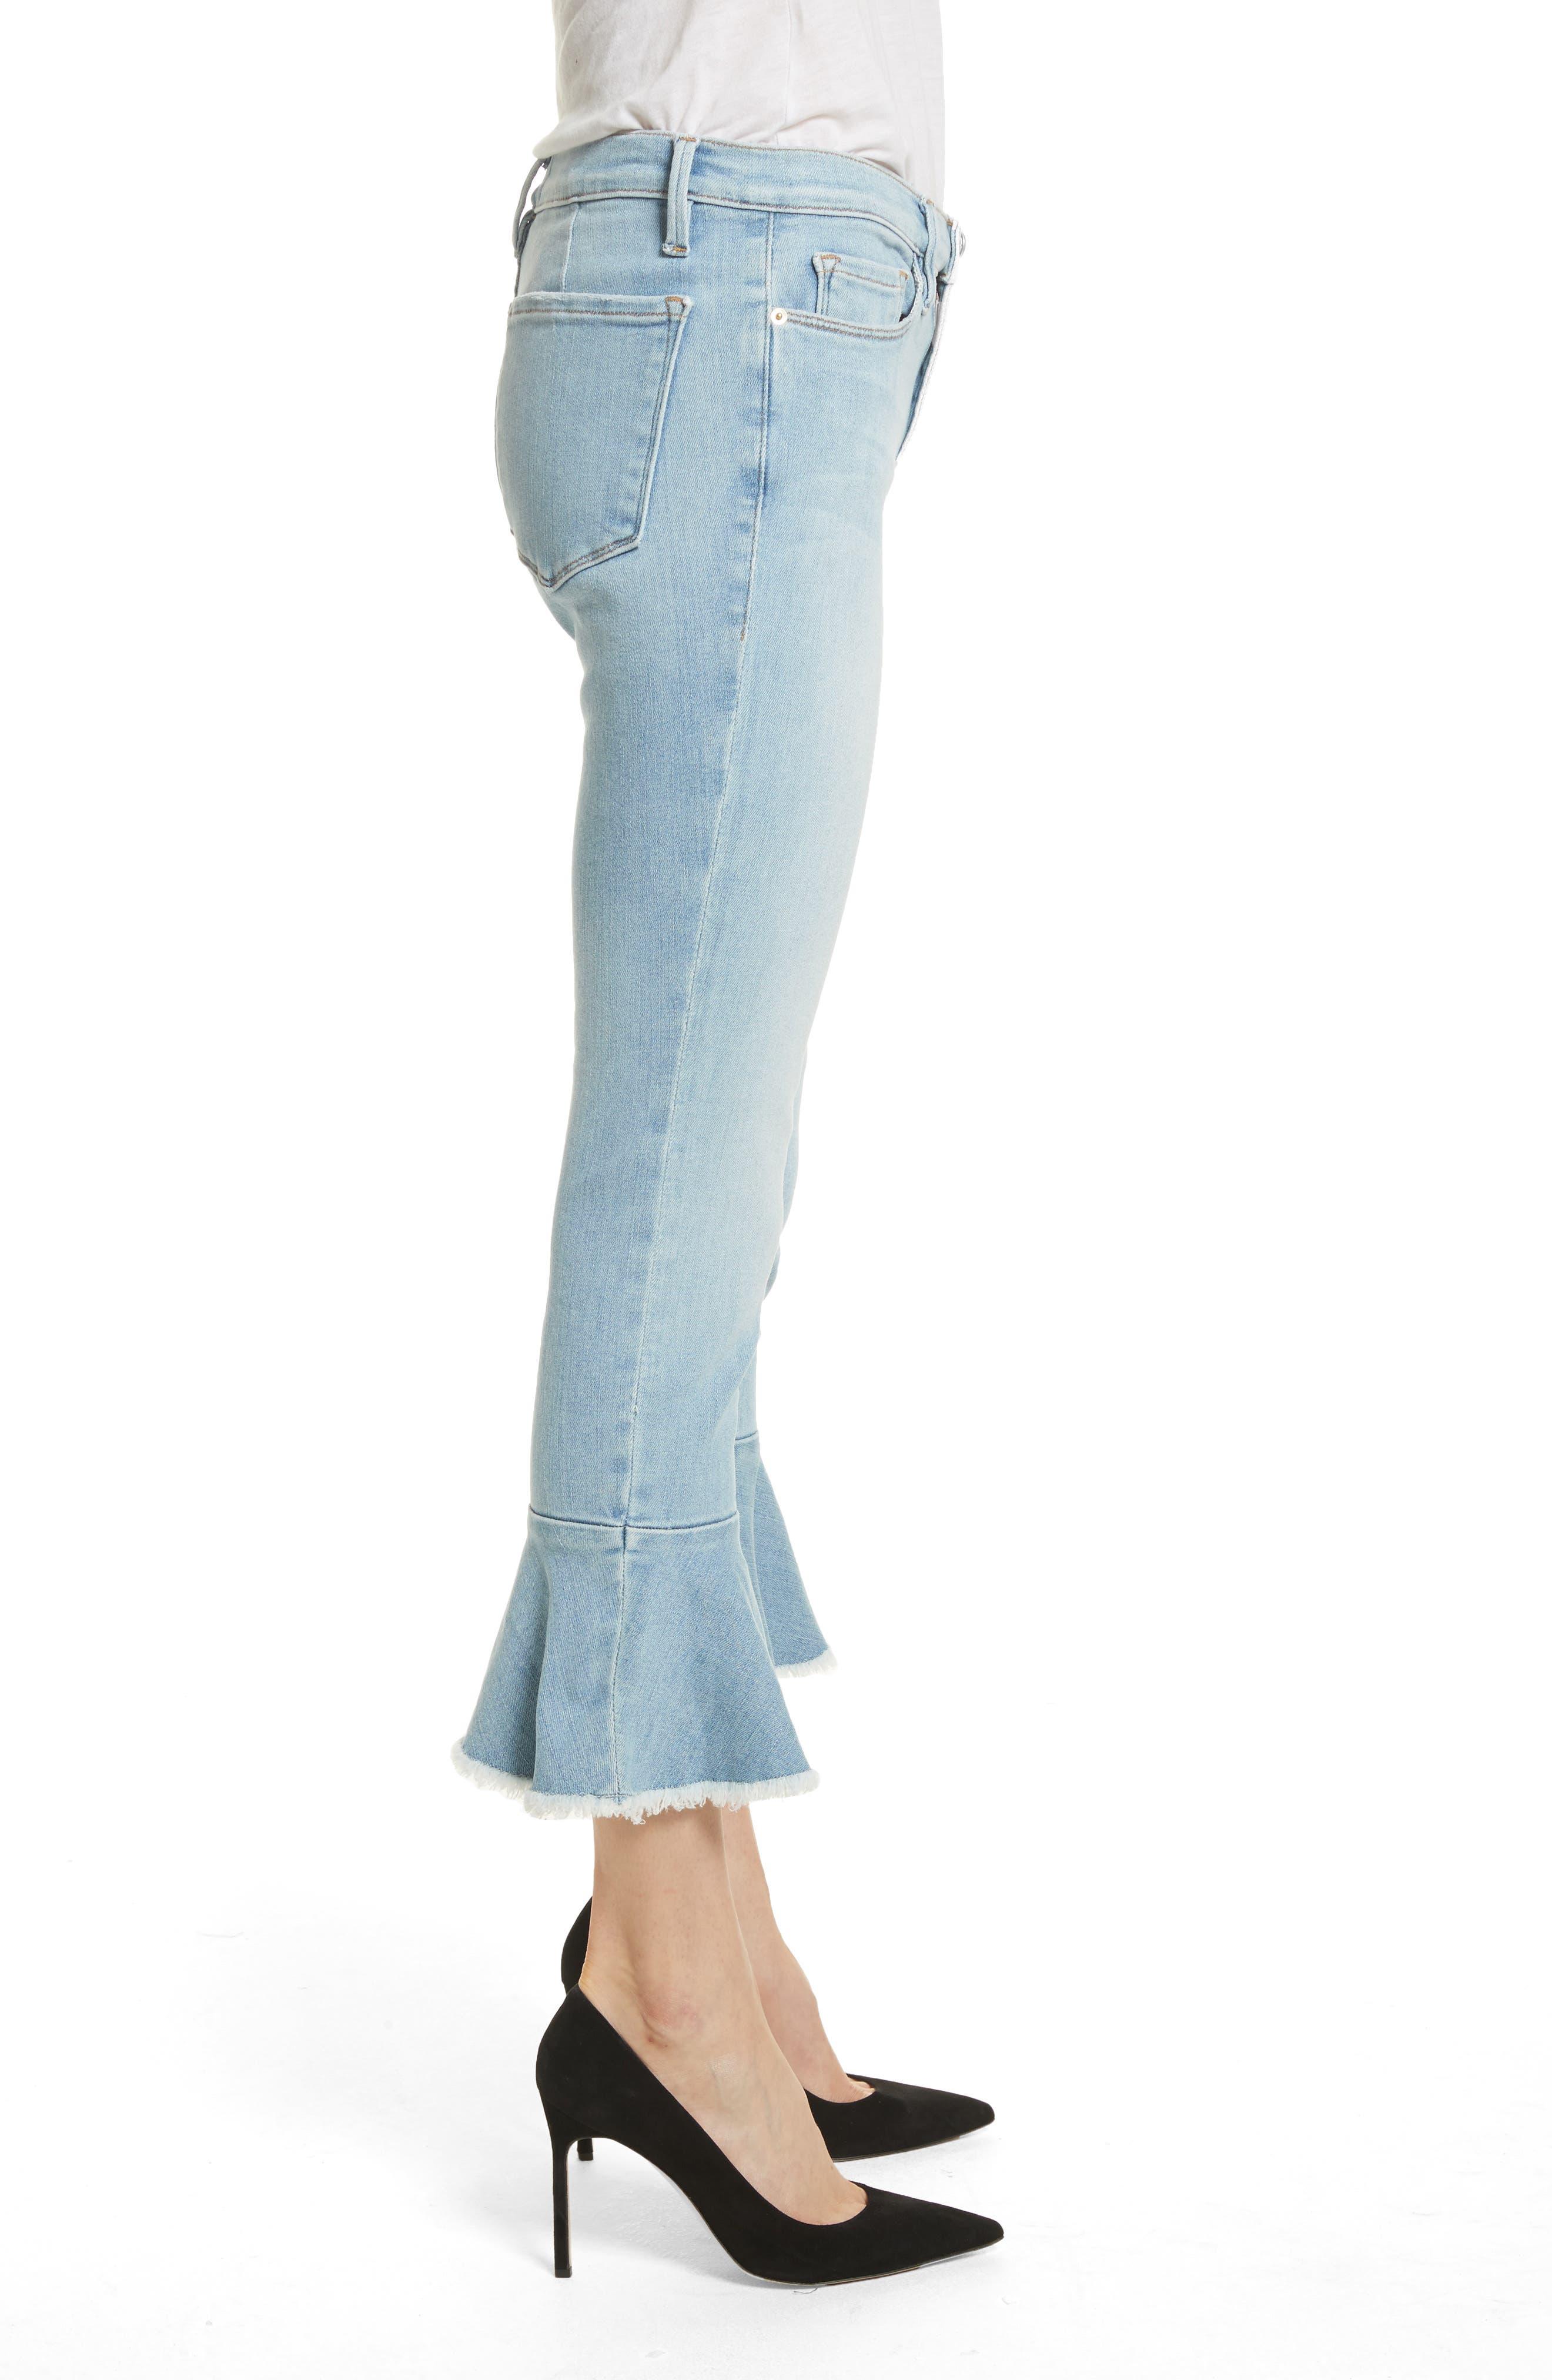 Le Skinny de Jeanne Flounce Skinny Jeans,                             Alternate thumbnail 3, color,                             Limer Stone